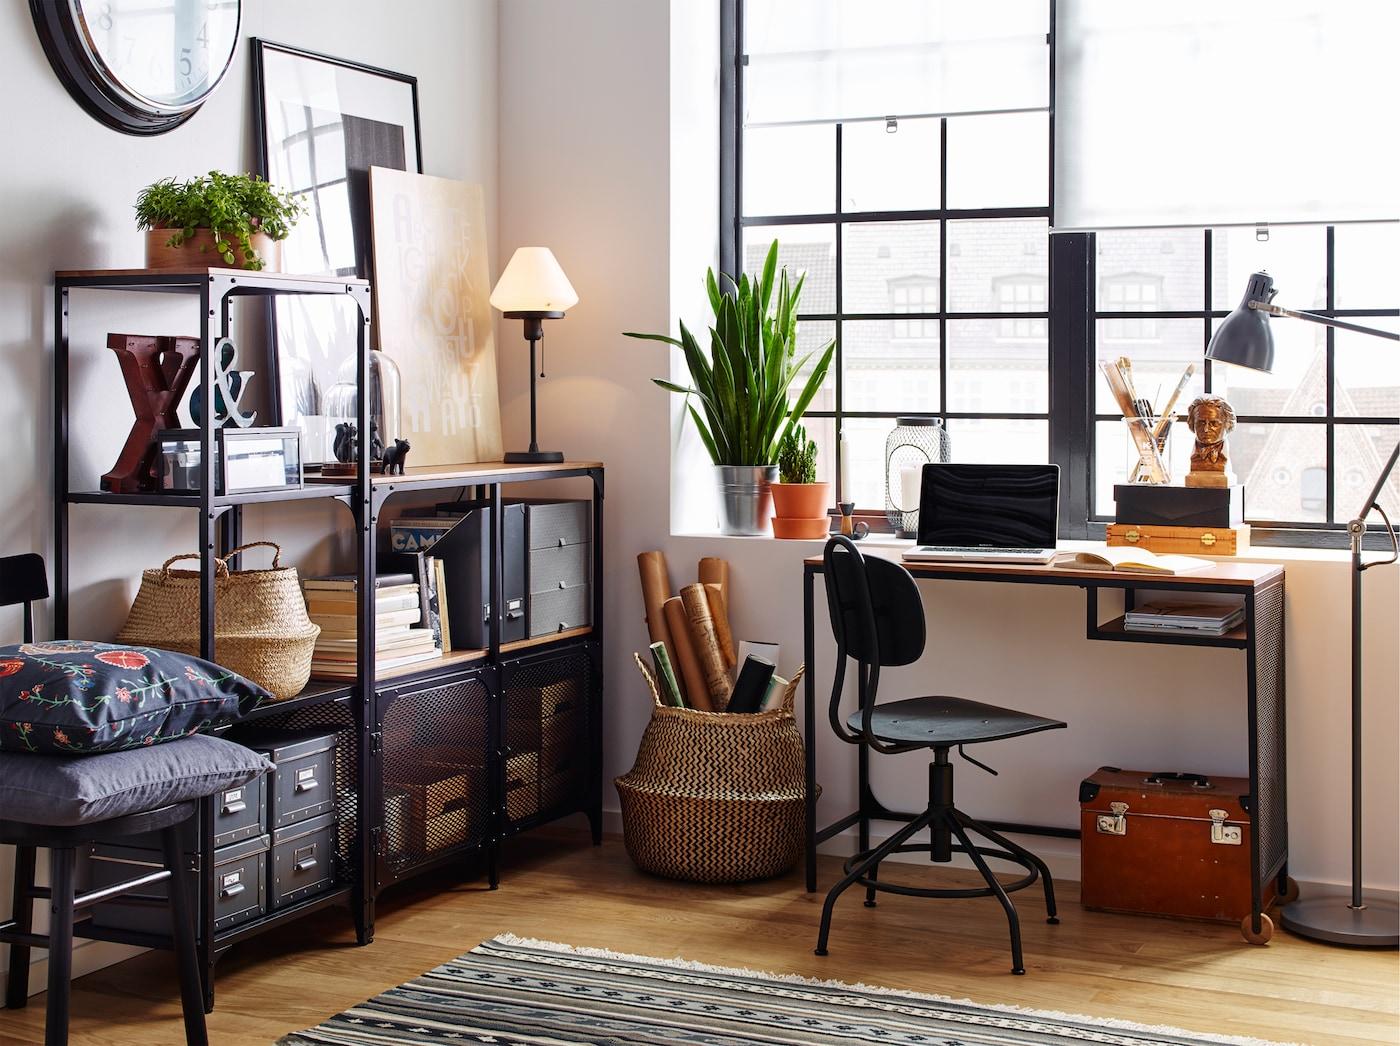 Coolitude urbaine pour votre coin bureau ikea